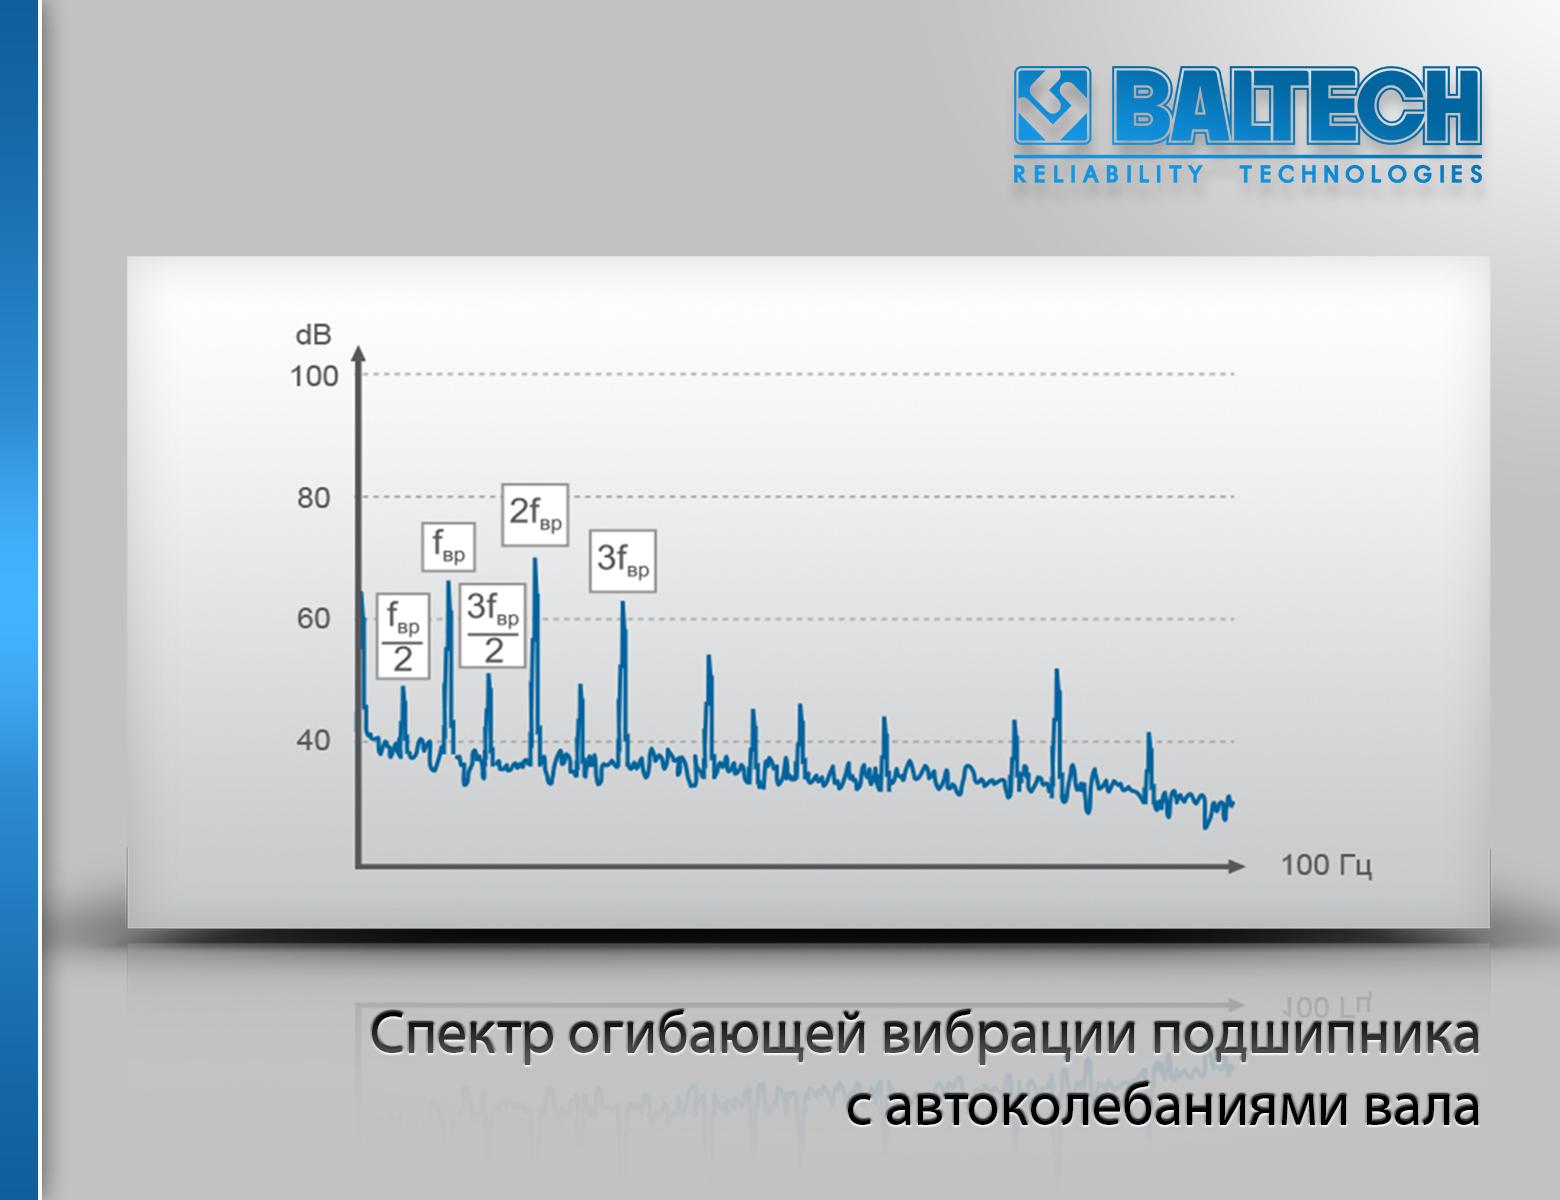 Спектр огибающей вибрации подшипника с автоколебаниями вала, диагностика подшипников